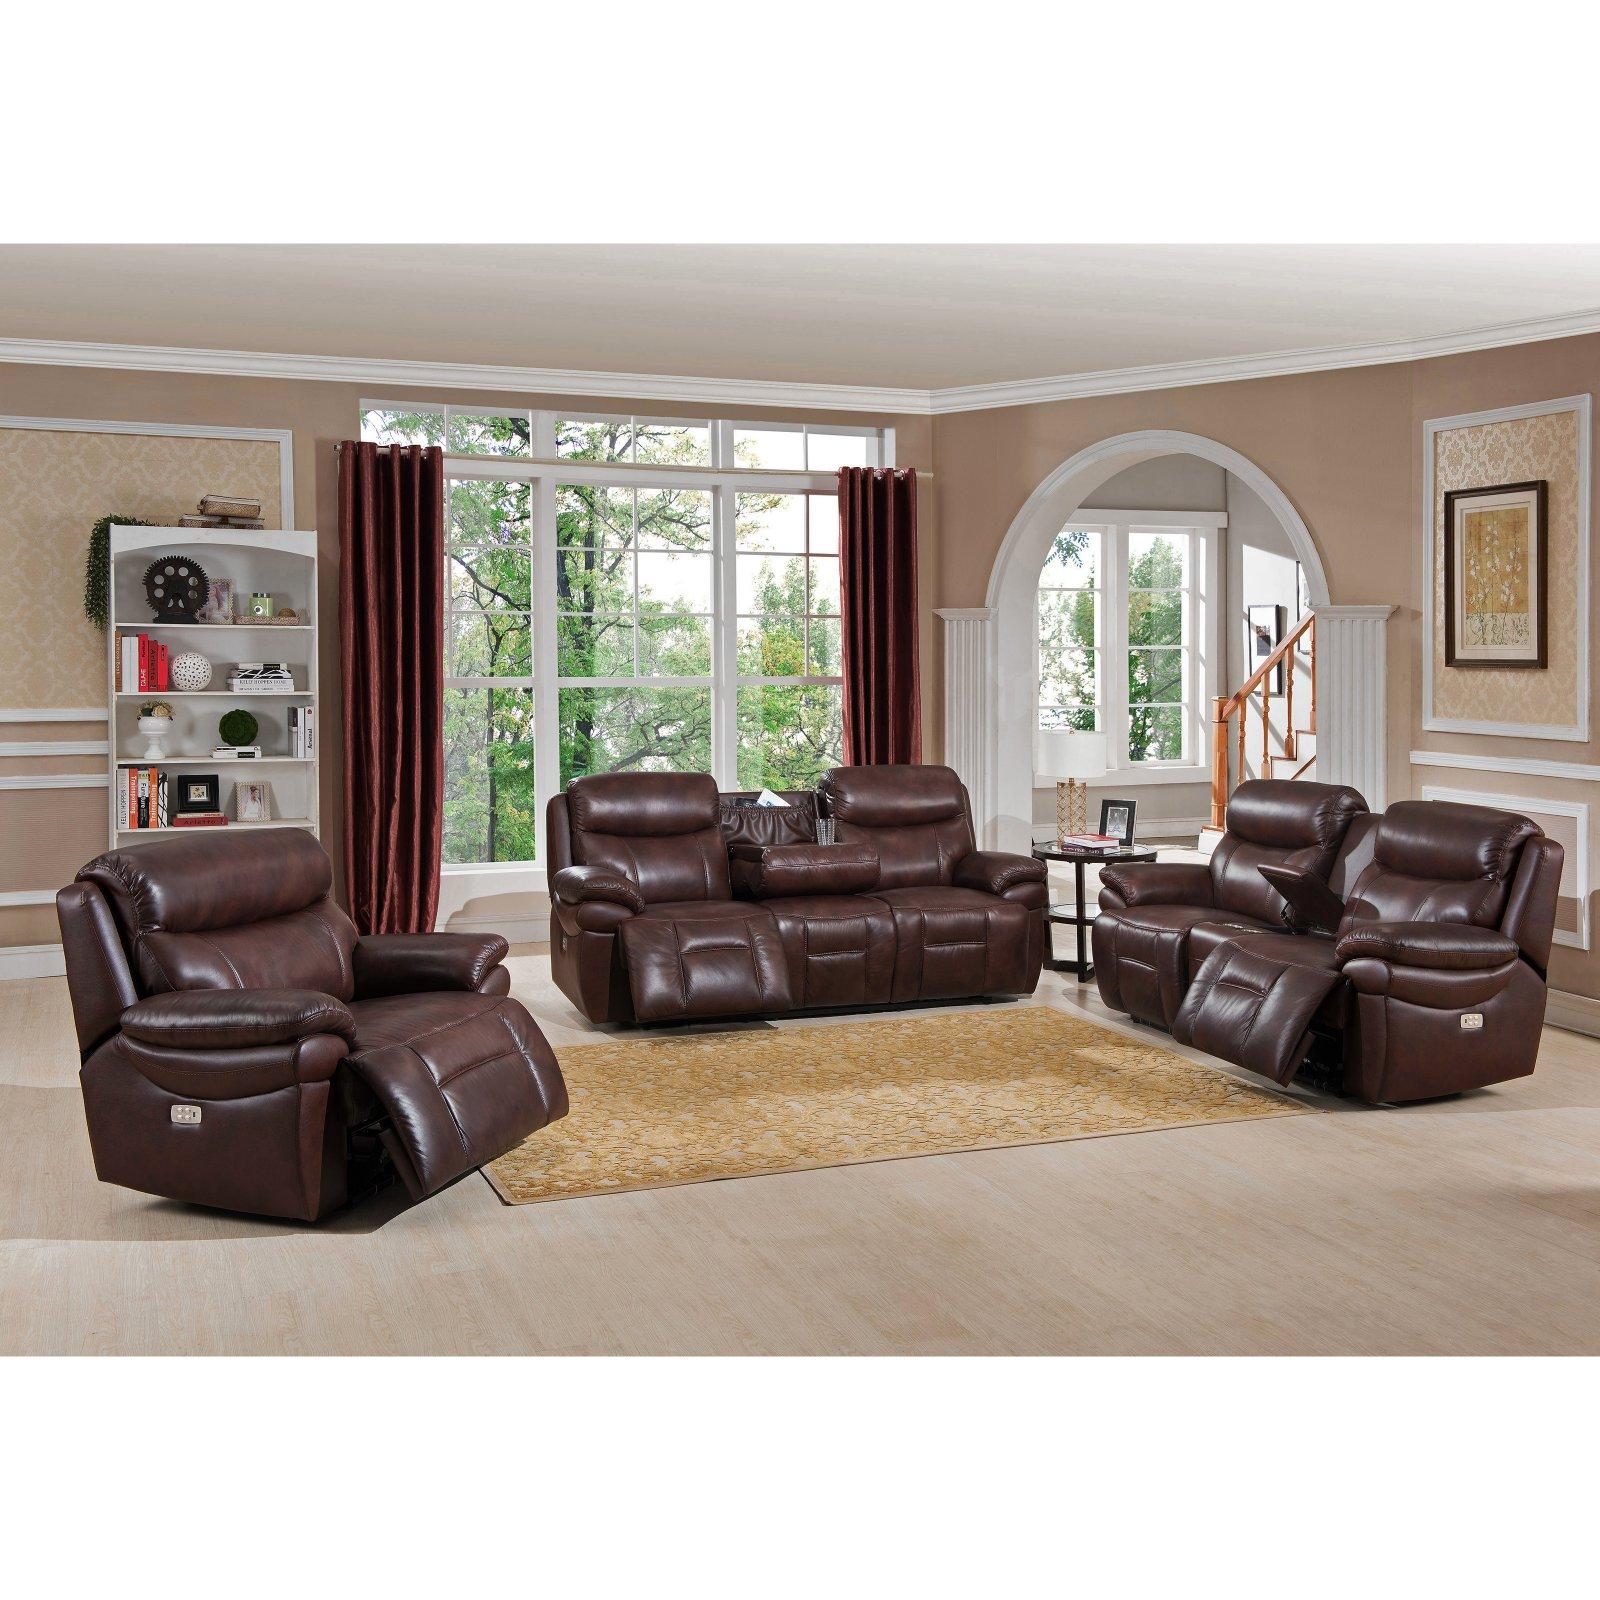 Best Amax Leather Summerlands Ii Top Grain Leather Power 3 400 x 300